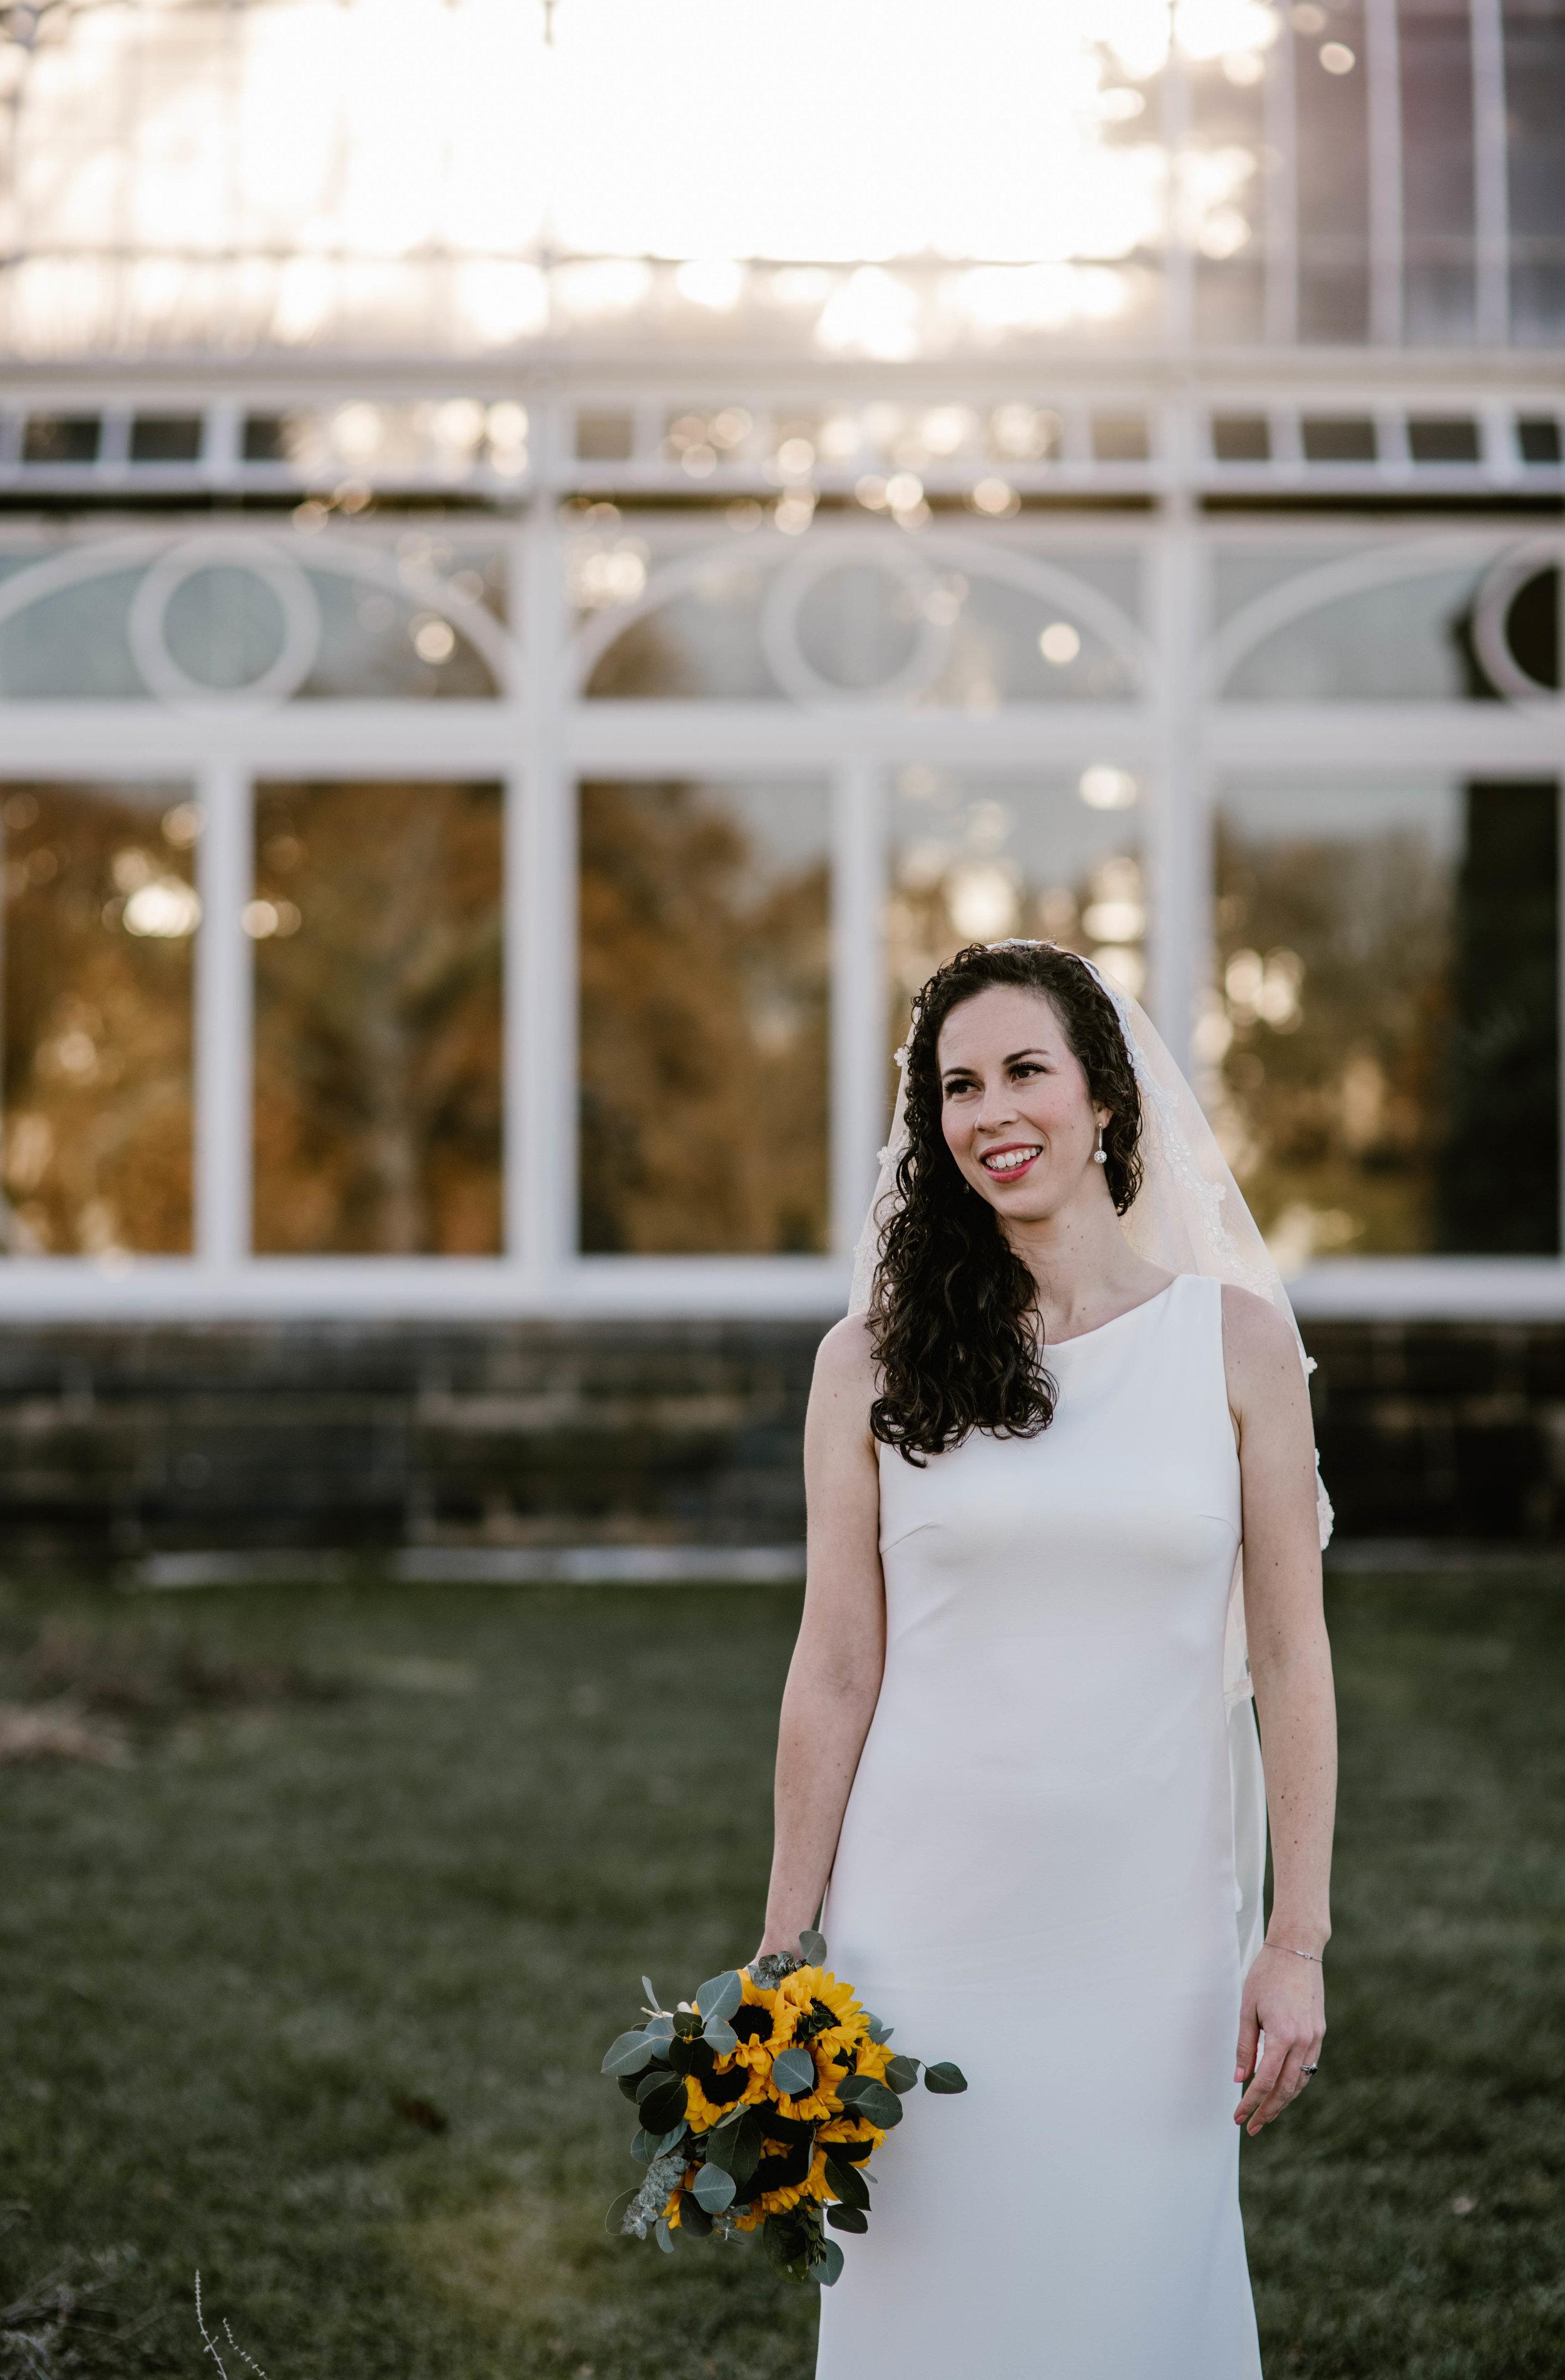 Kristy Lumsden Photography_Pittsburgh Wedding Photographer_49.jpg